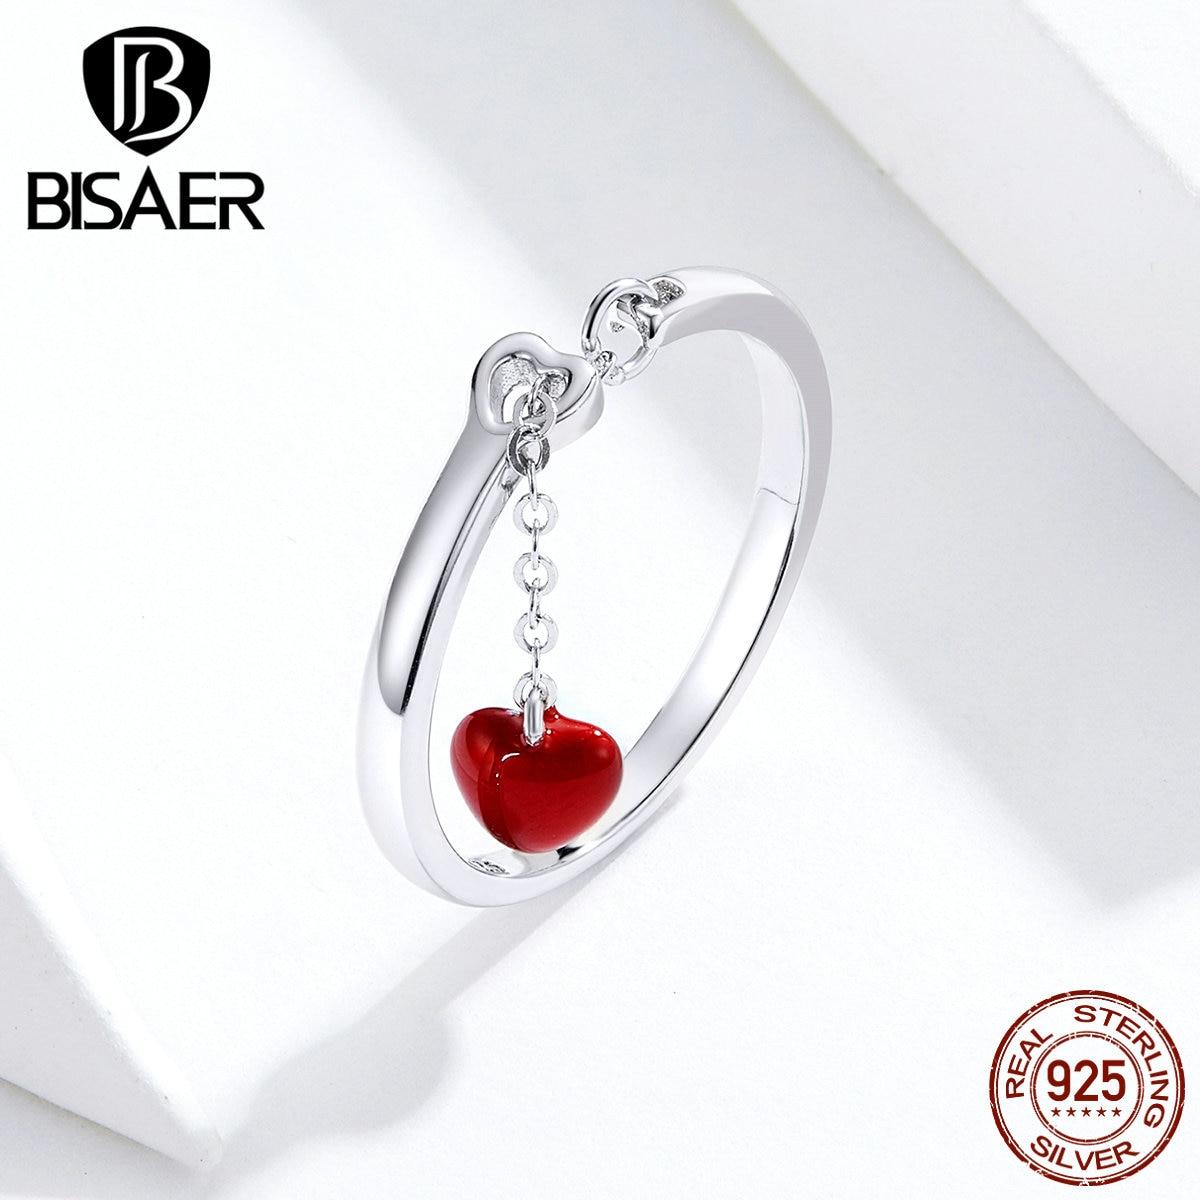 Heartbeats anillos BISAER regalo de San Valentín Plata de Ley 925 esmalte rojo cadena larga anillos de dedo para mujer joyería de plata ECR627